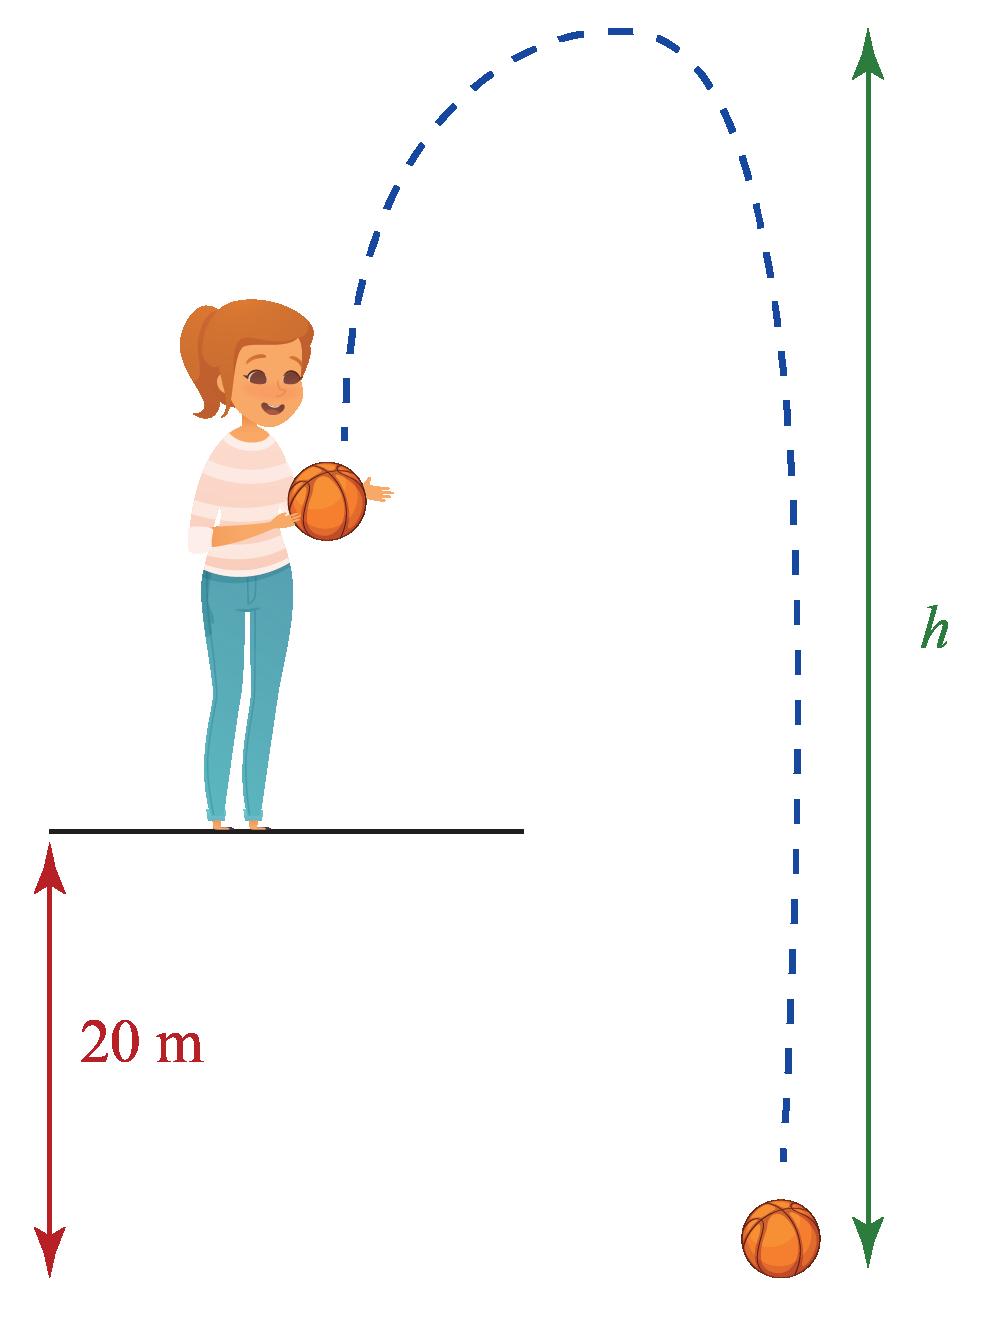 Quadratic Equation Area of Motion Example